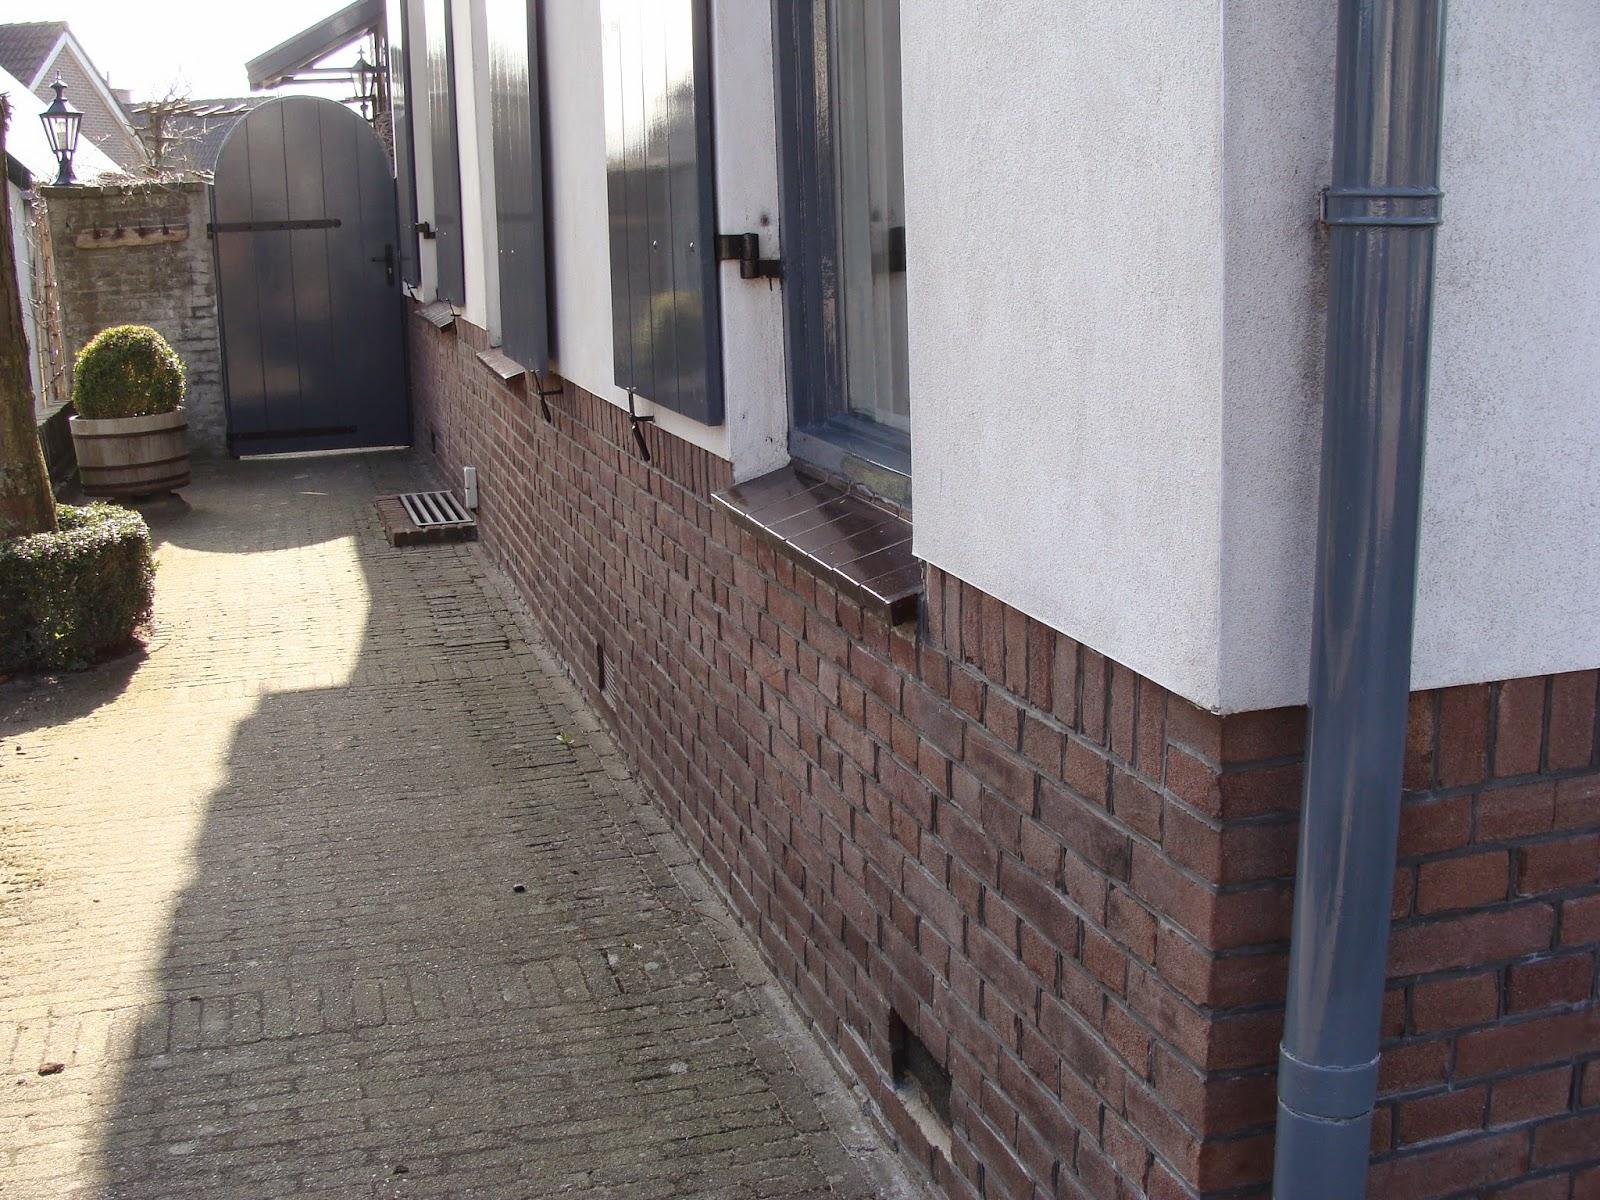 De hortensiatuin april 2015 - Buitenkant thuis ...